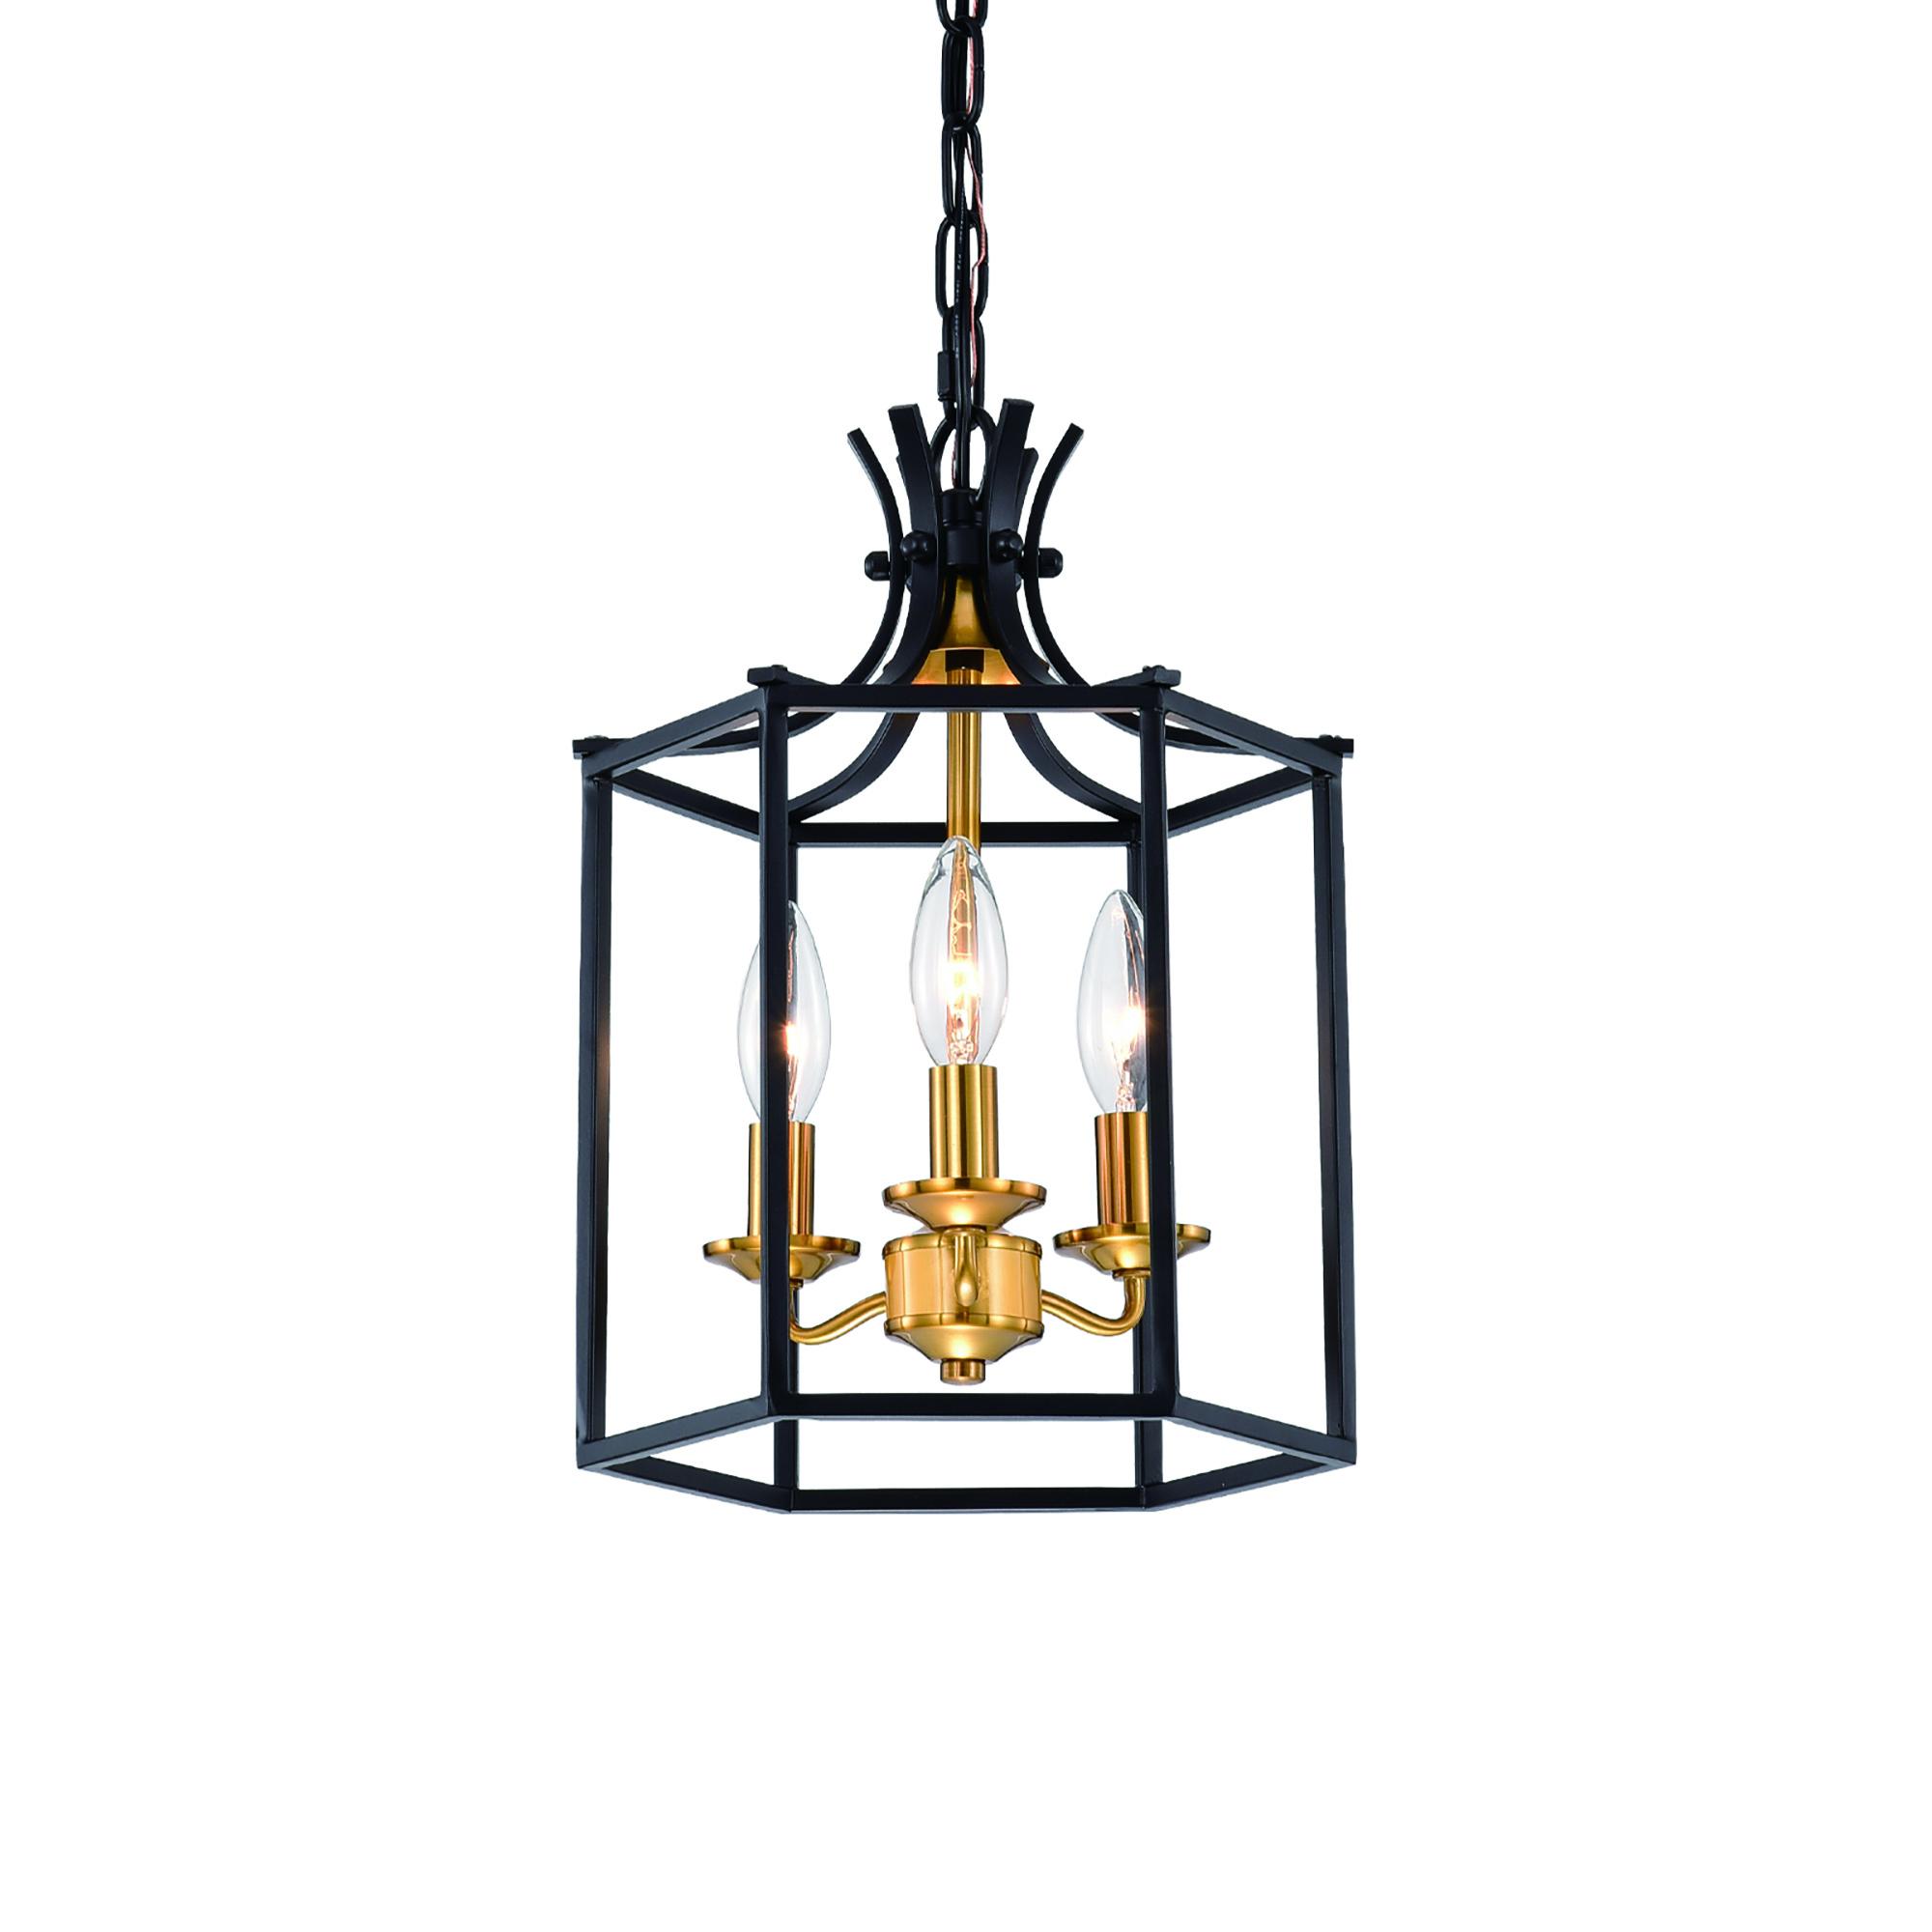 3-Light Black and Antique Gold Lantern Statement